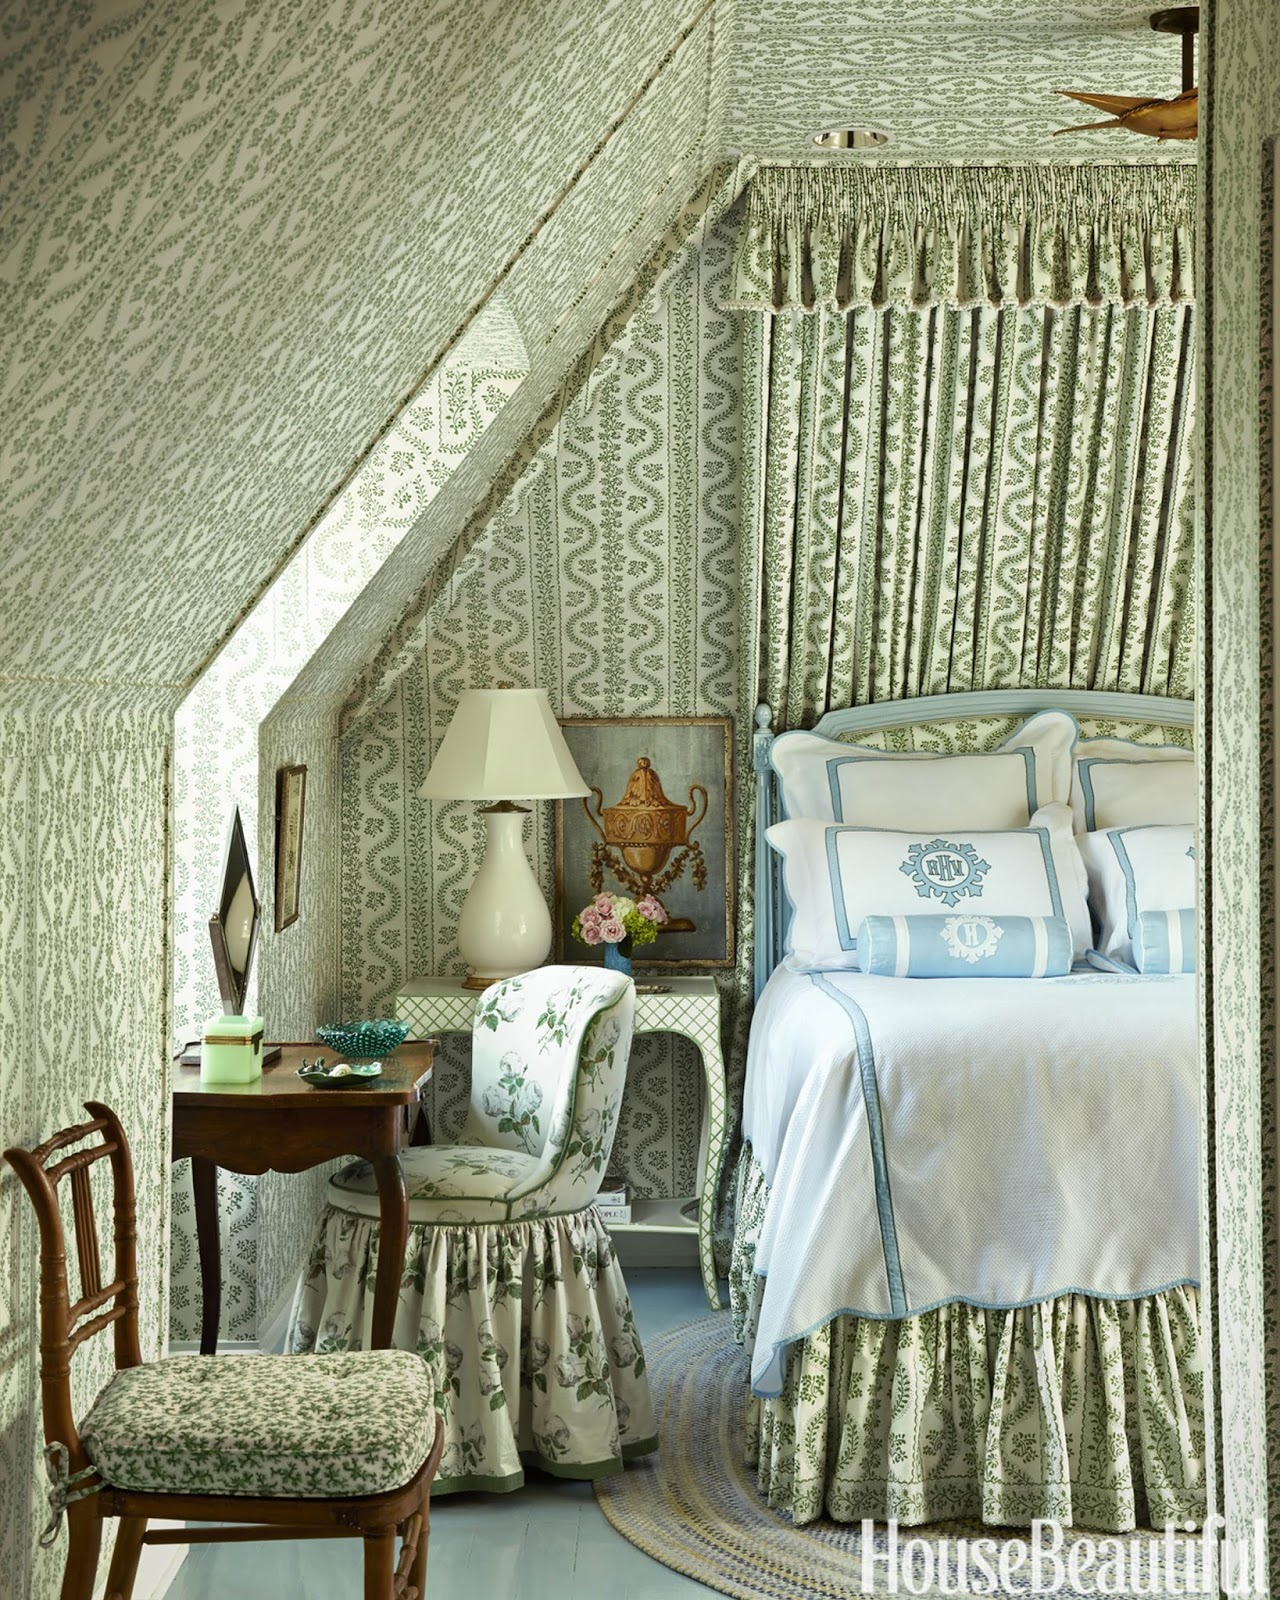 Eye For Design: Cozy Attic Bedrooms